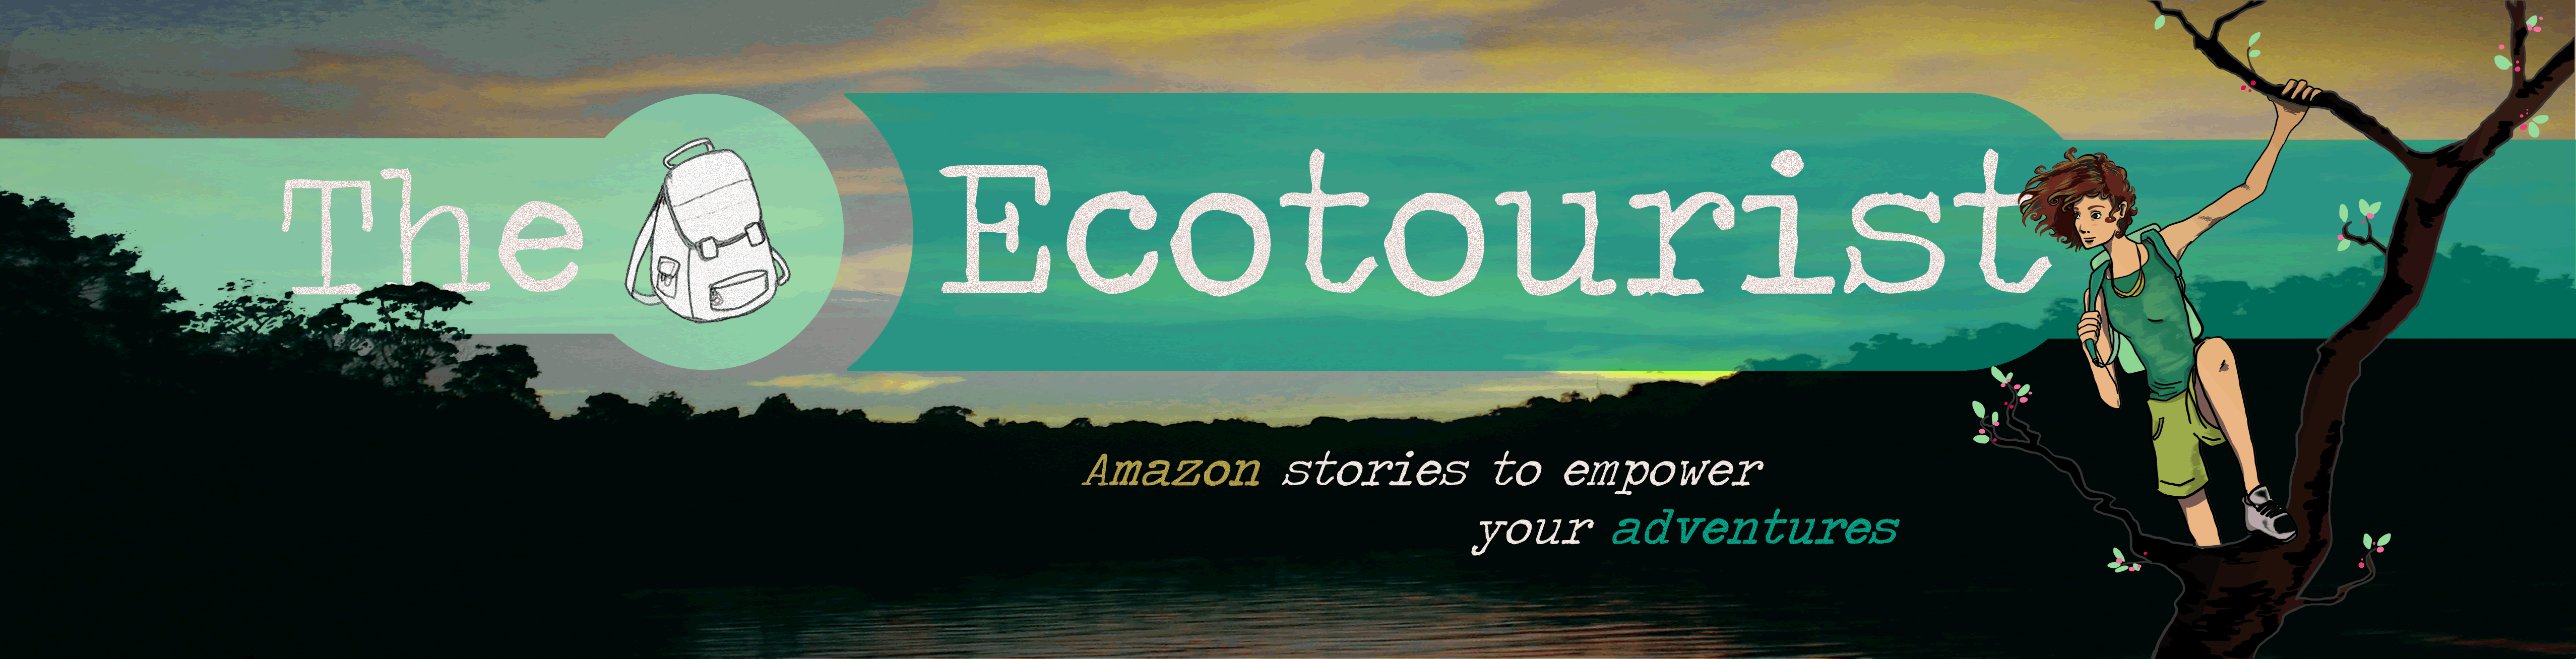 The Ecotourist